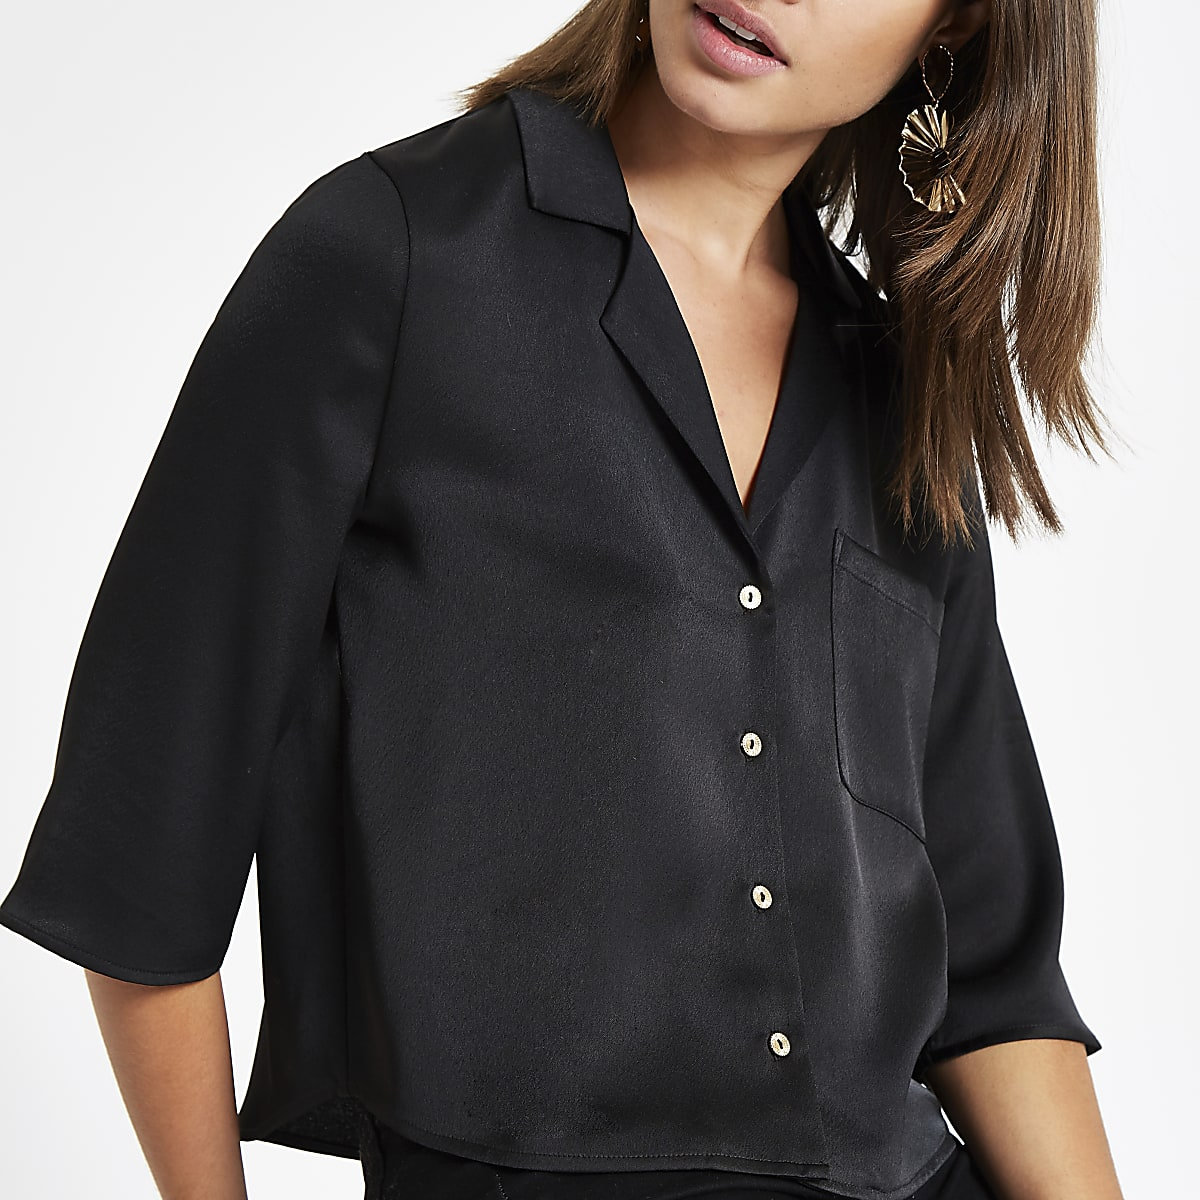 Black button crop shirt